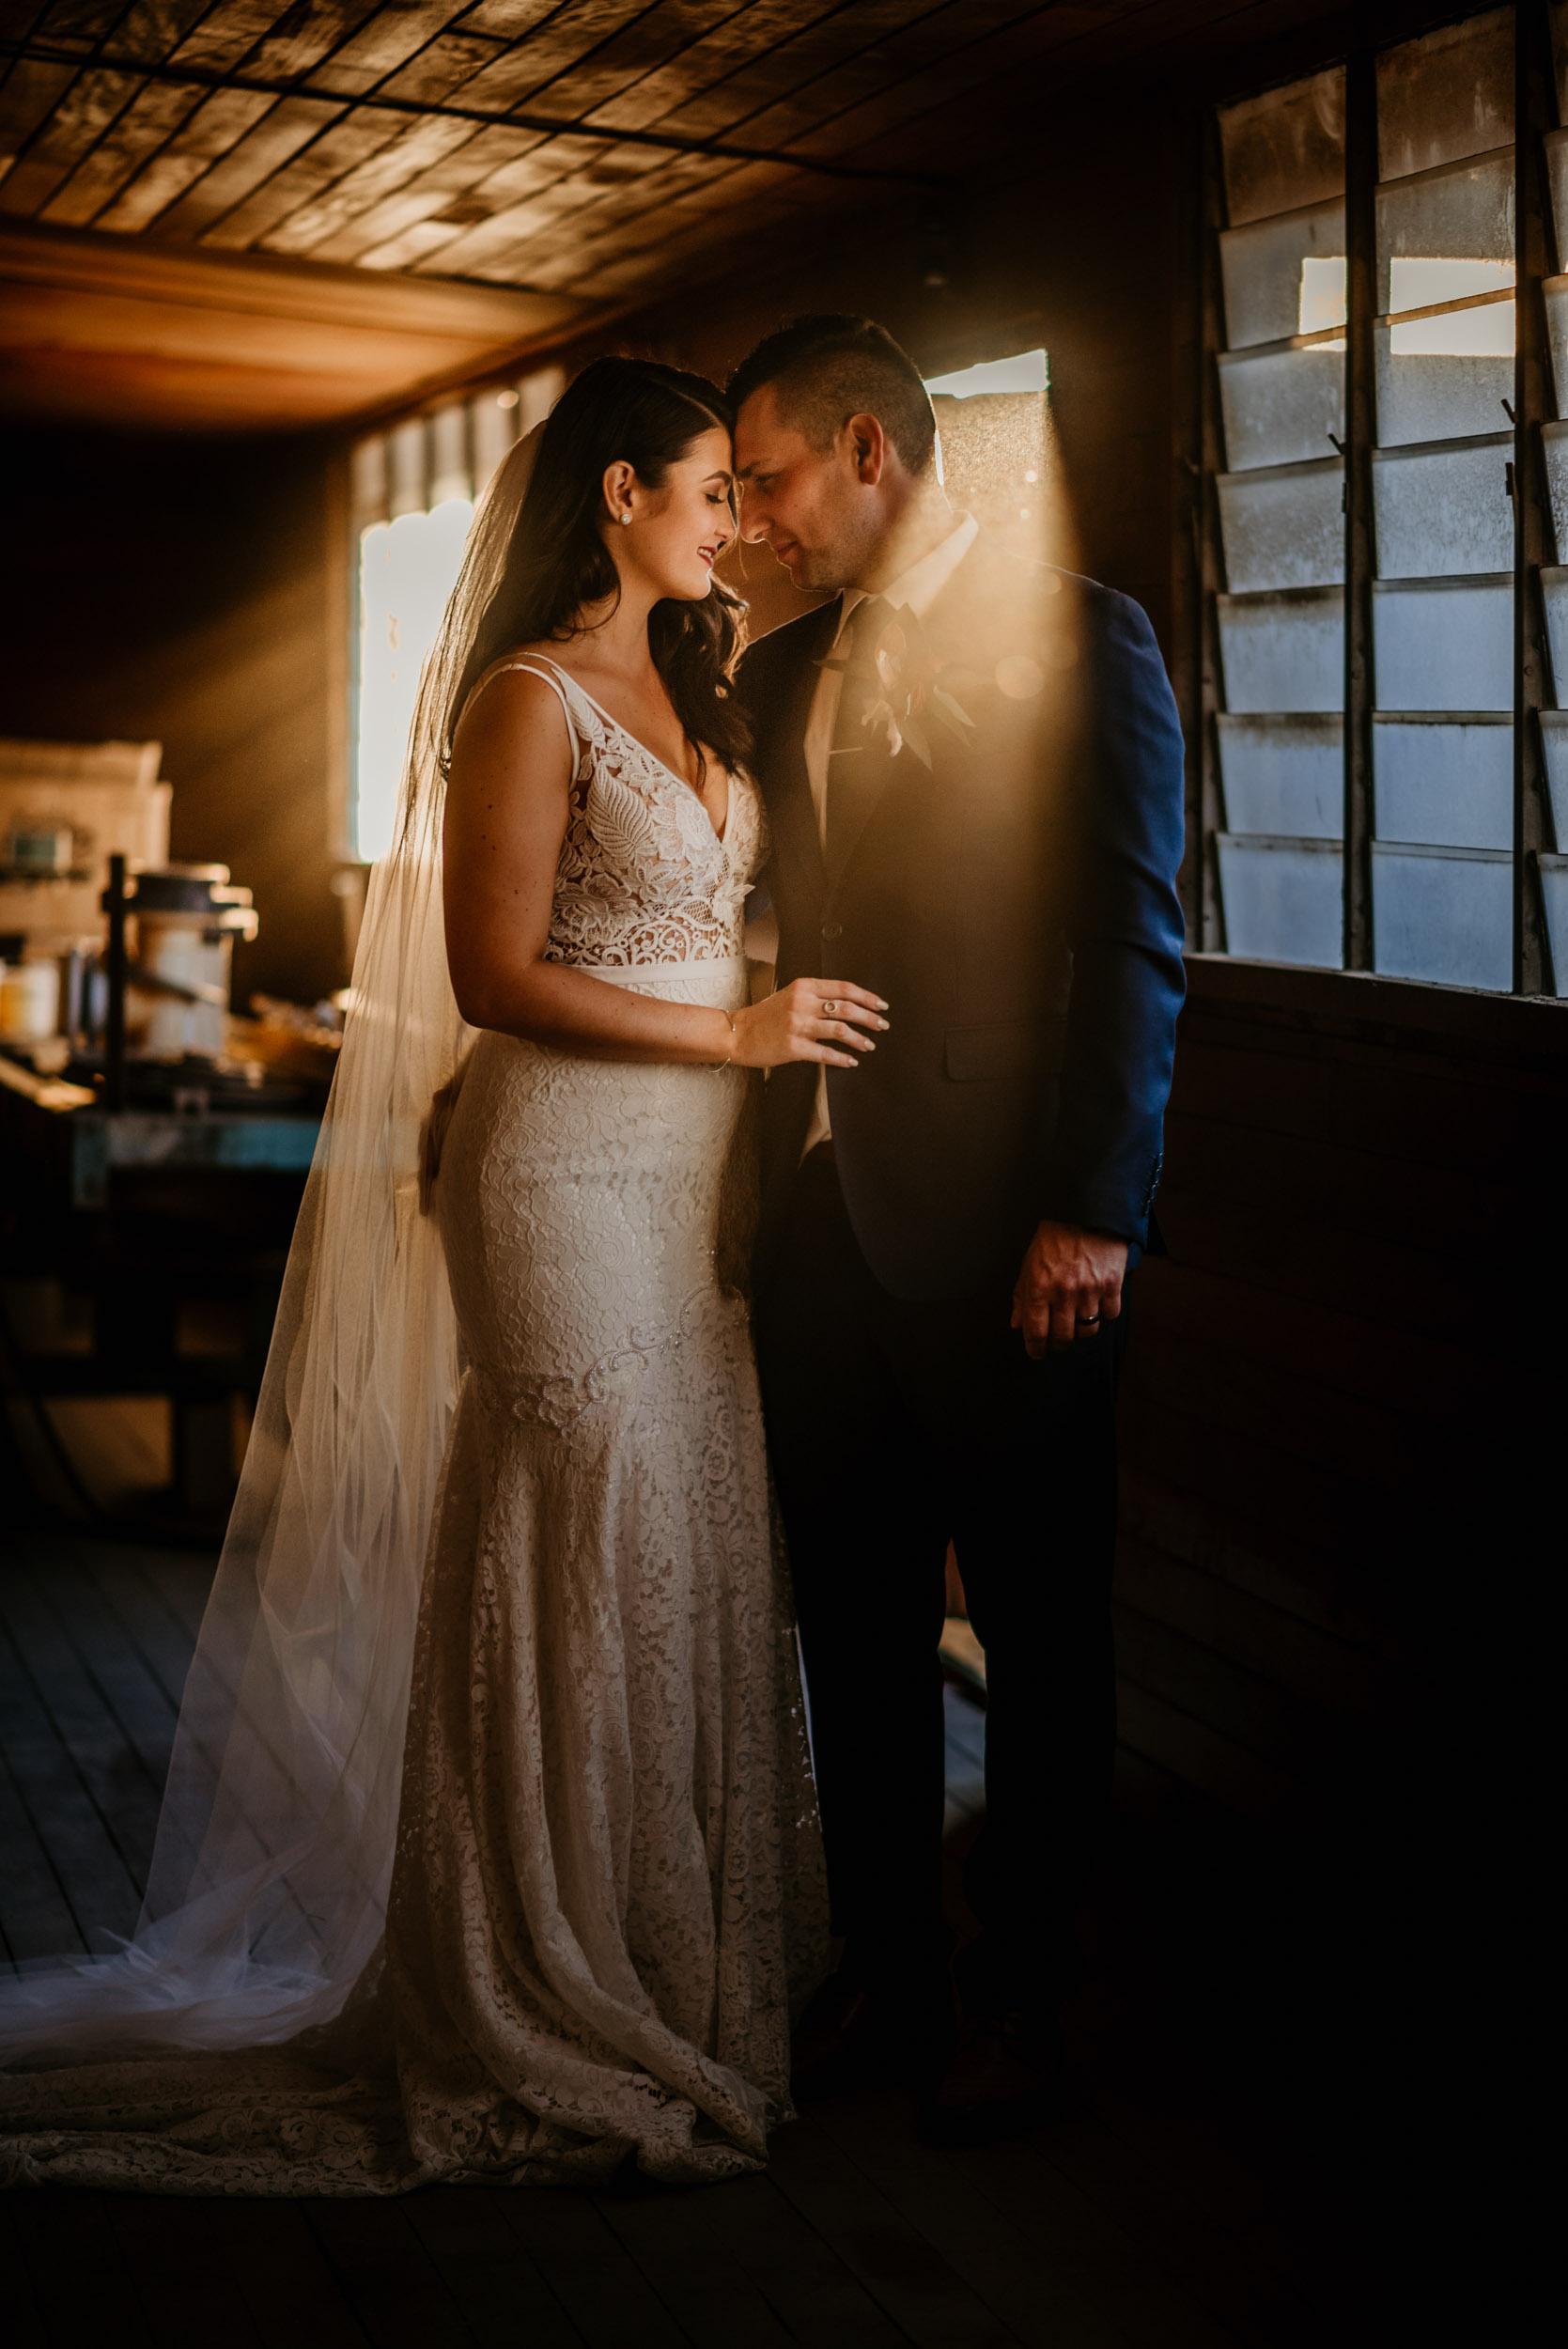 The Raw Photographer - Cairns and Port Douglas Wedding Photographer - Best of 2018-37.jpg